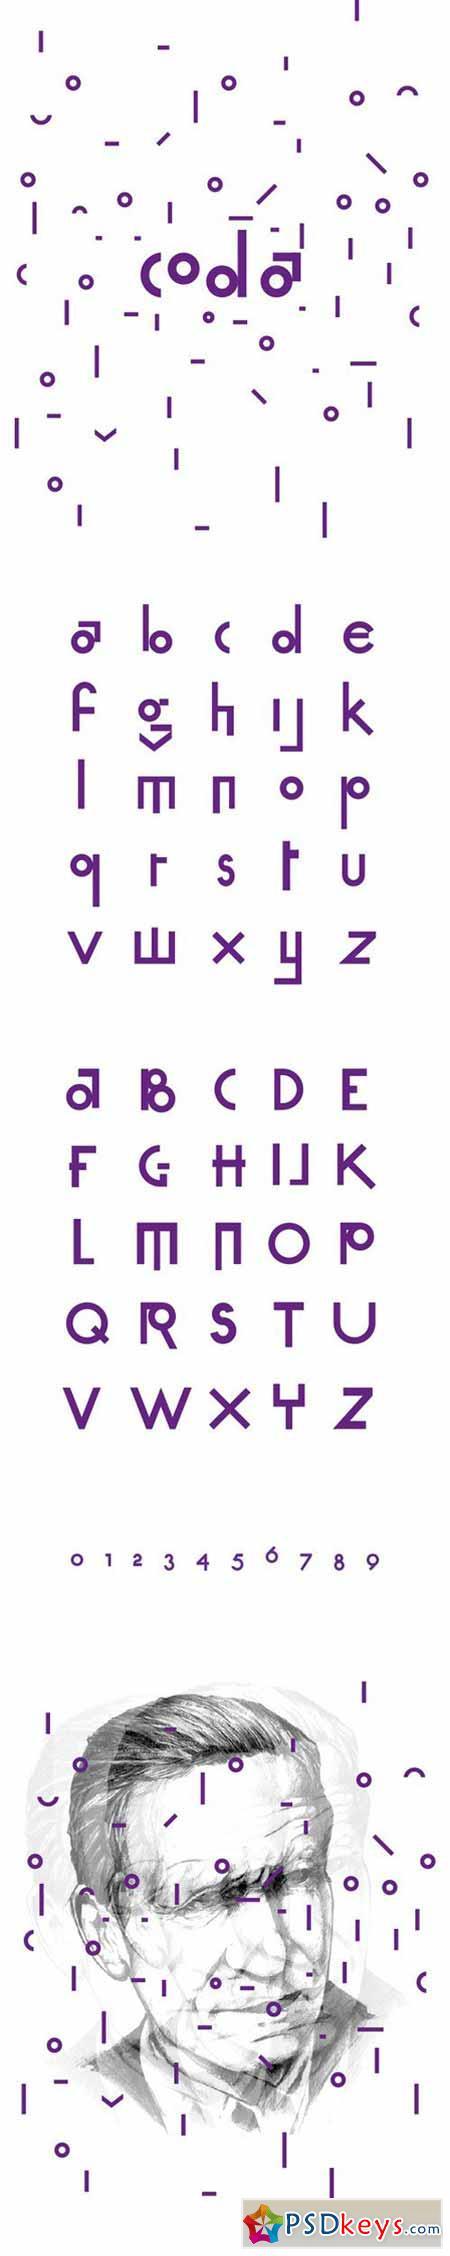 Coda typeface